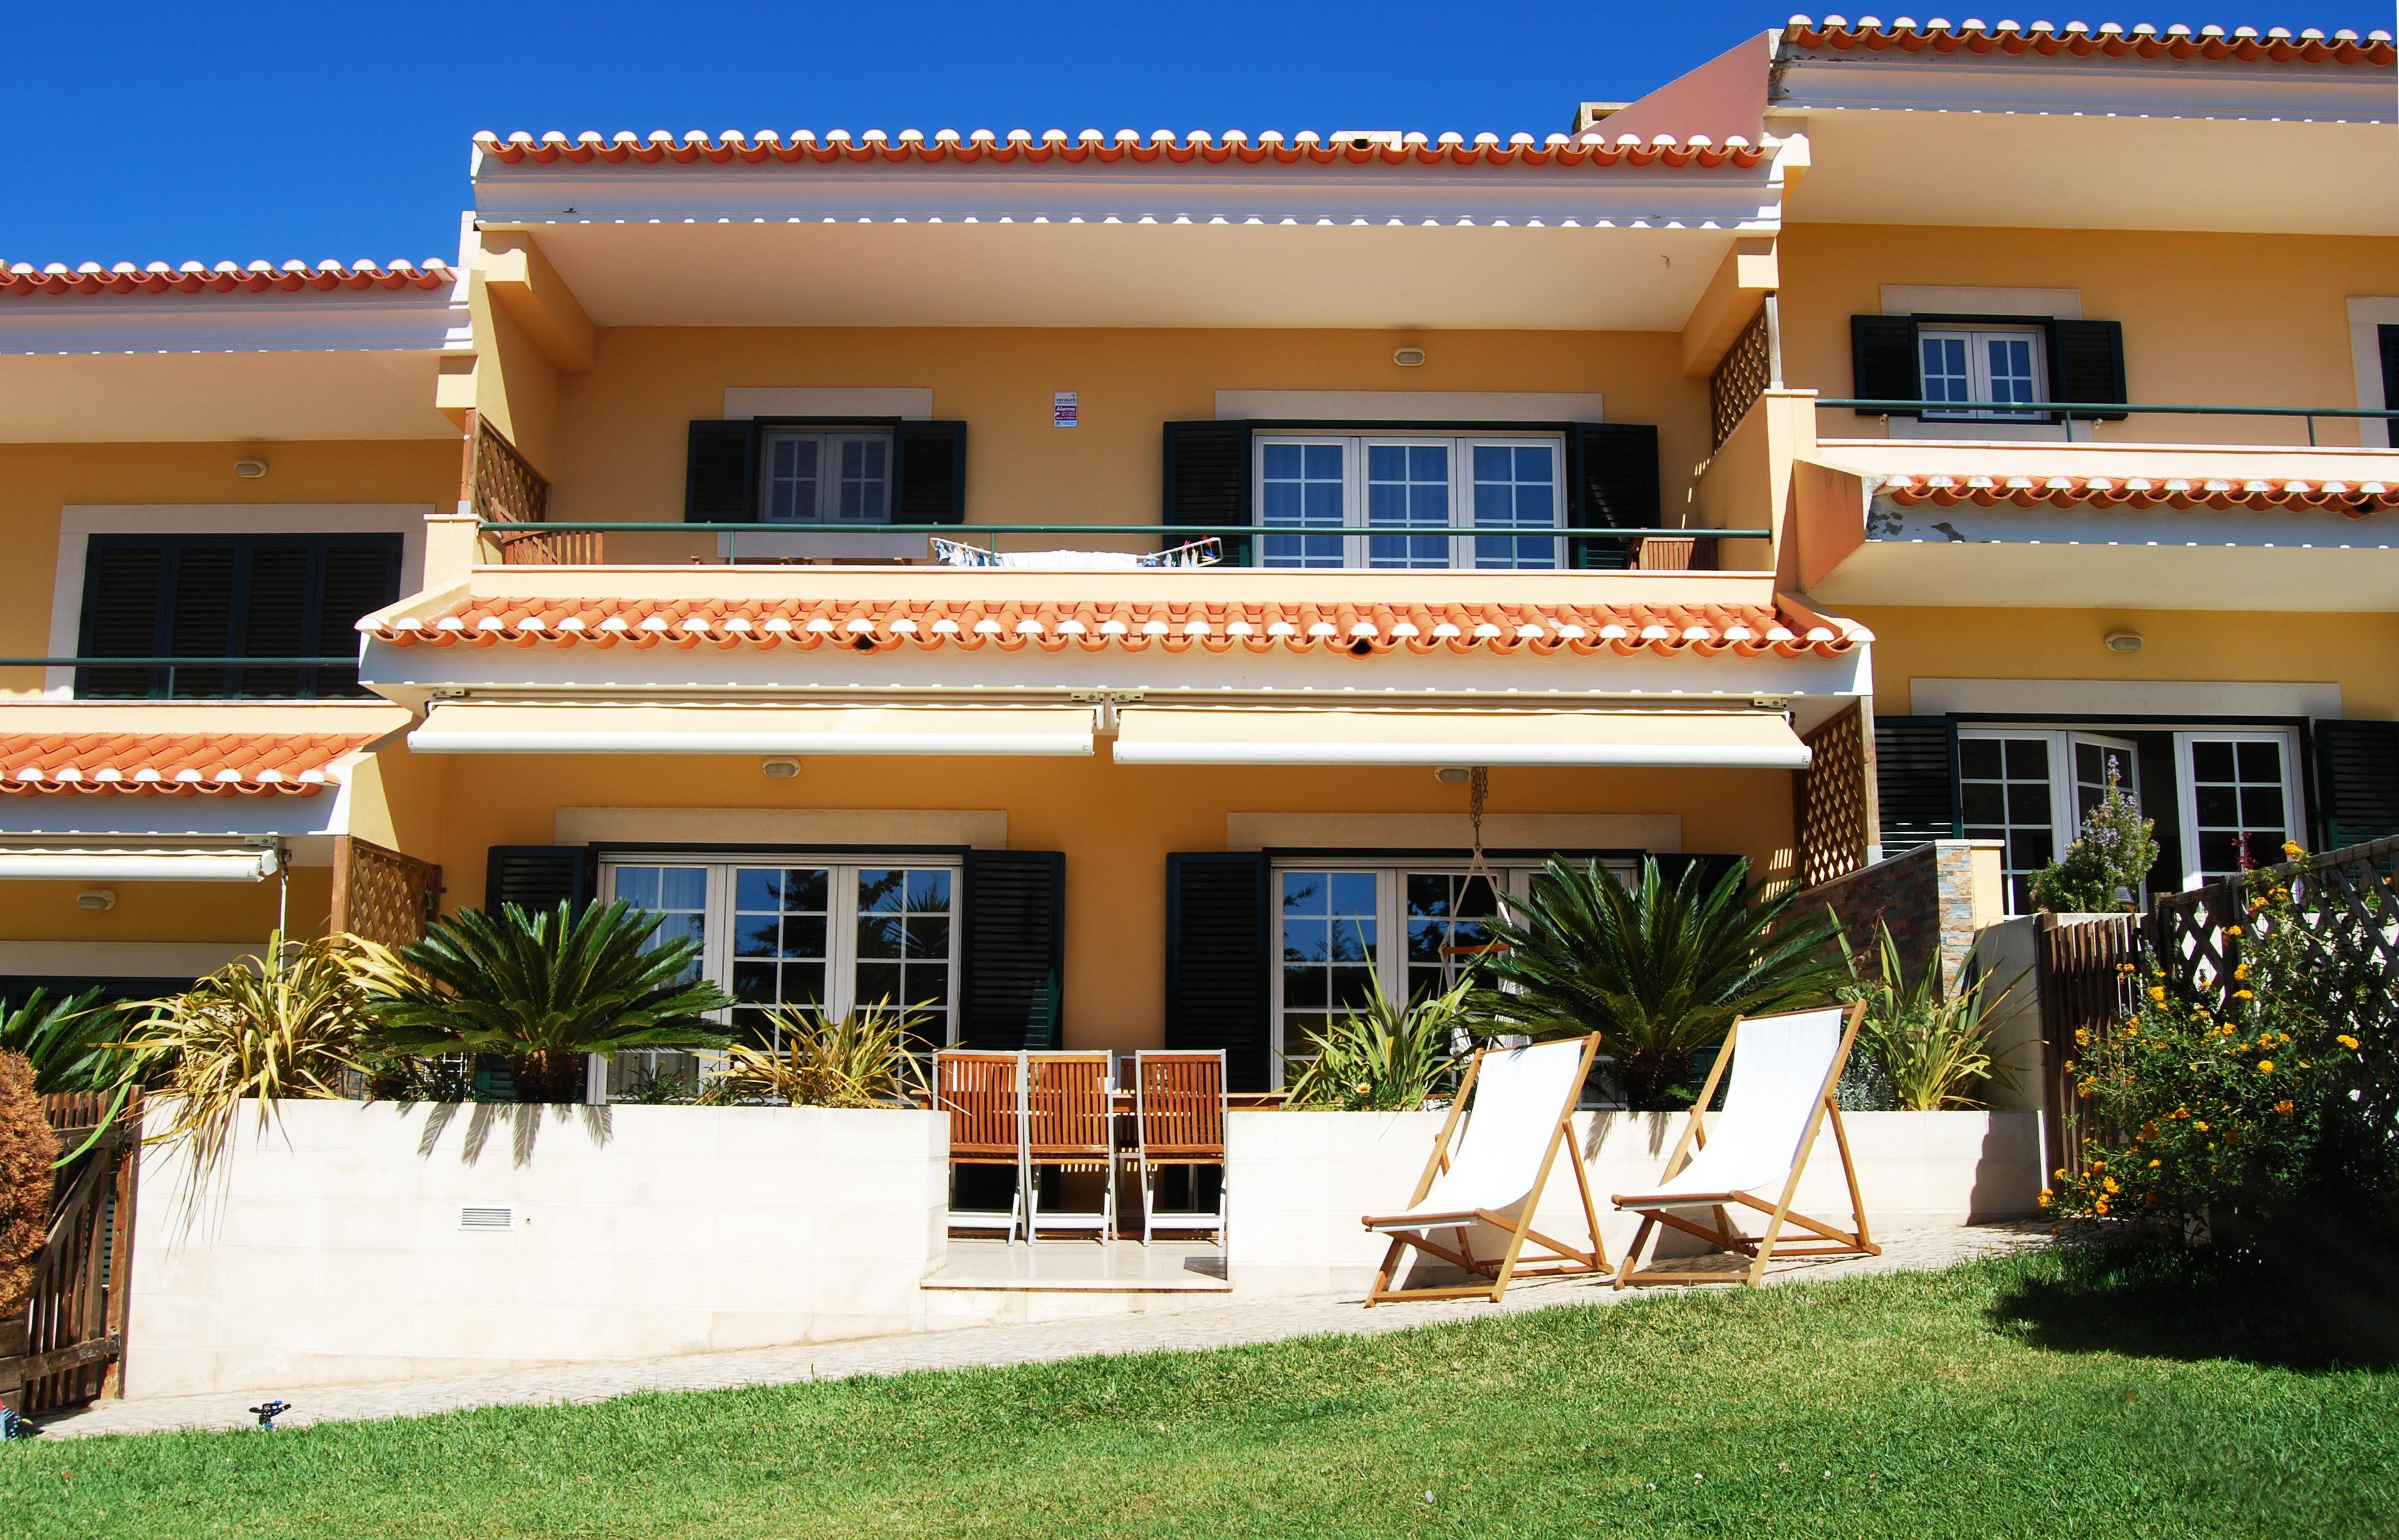 Casa Unifamiliar por un Venta en Terraced house, 4 bedrooms, for Sale Cascais, Lisboa, Portugal